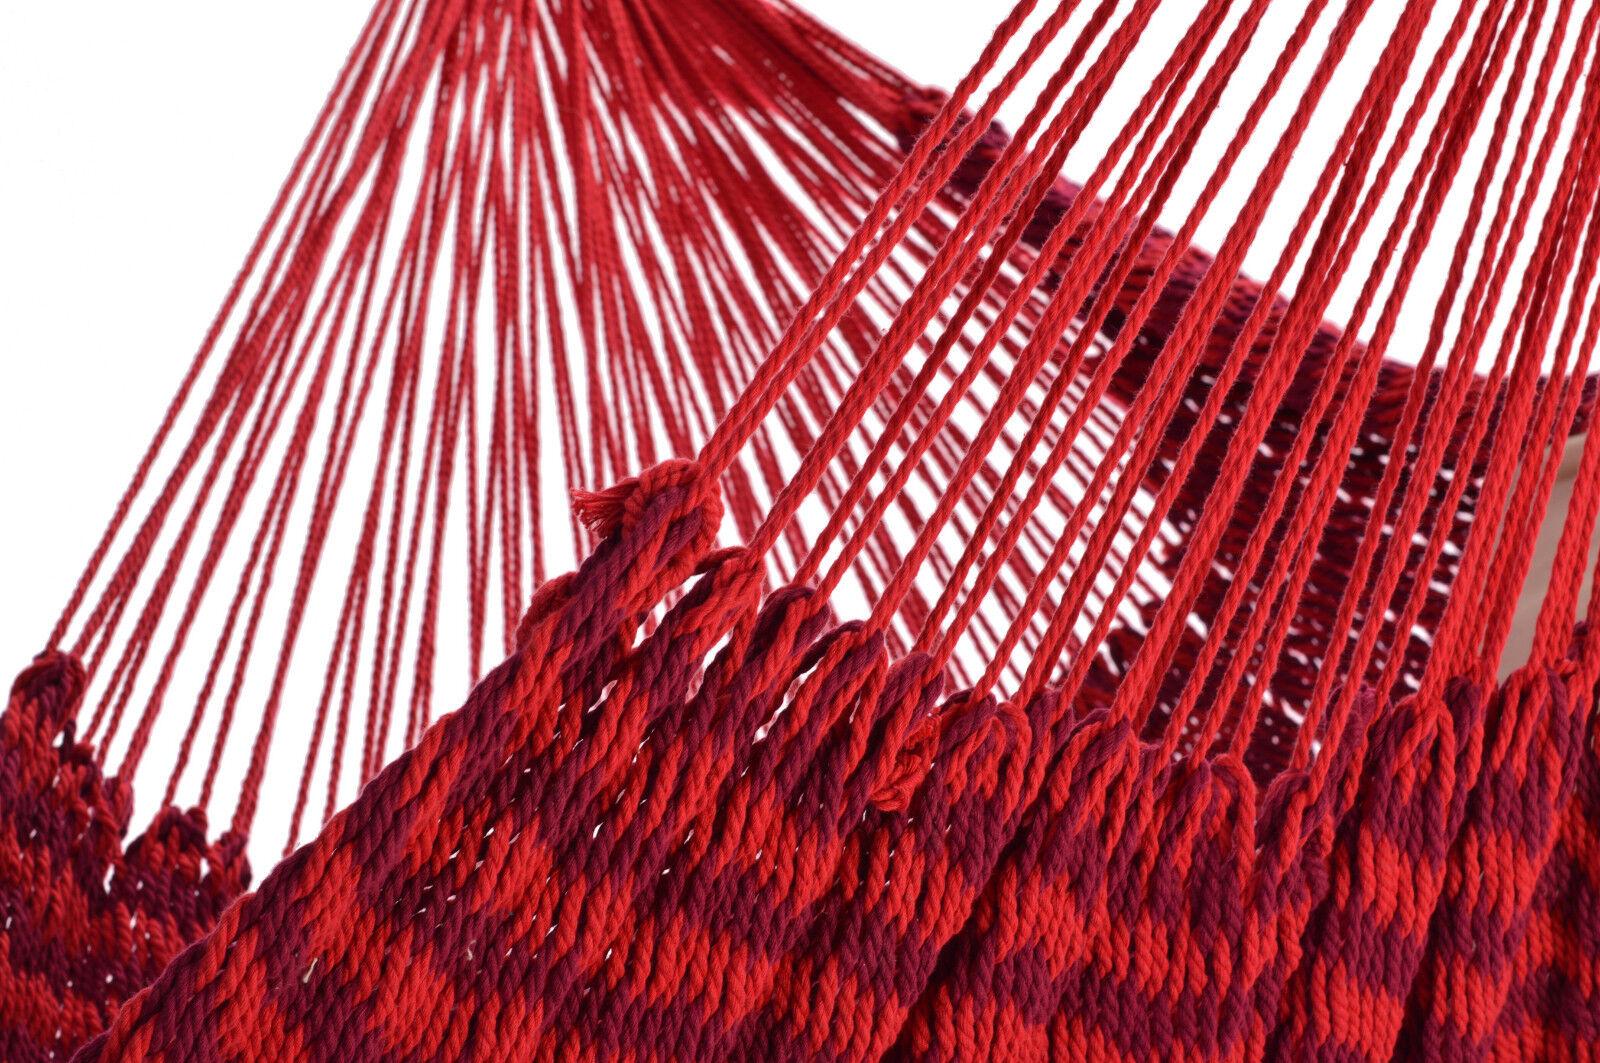 Bio Baumwolle Netz-Hängesessel-Hängesitz Hängestuhl Balao Balao Balao Rubin rot Fair Trade | Roman  | Zart  43c61d